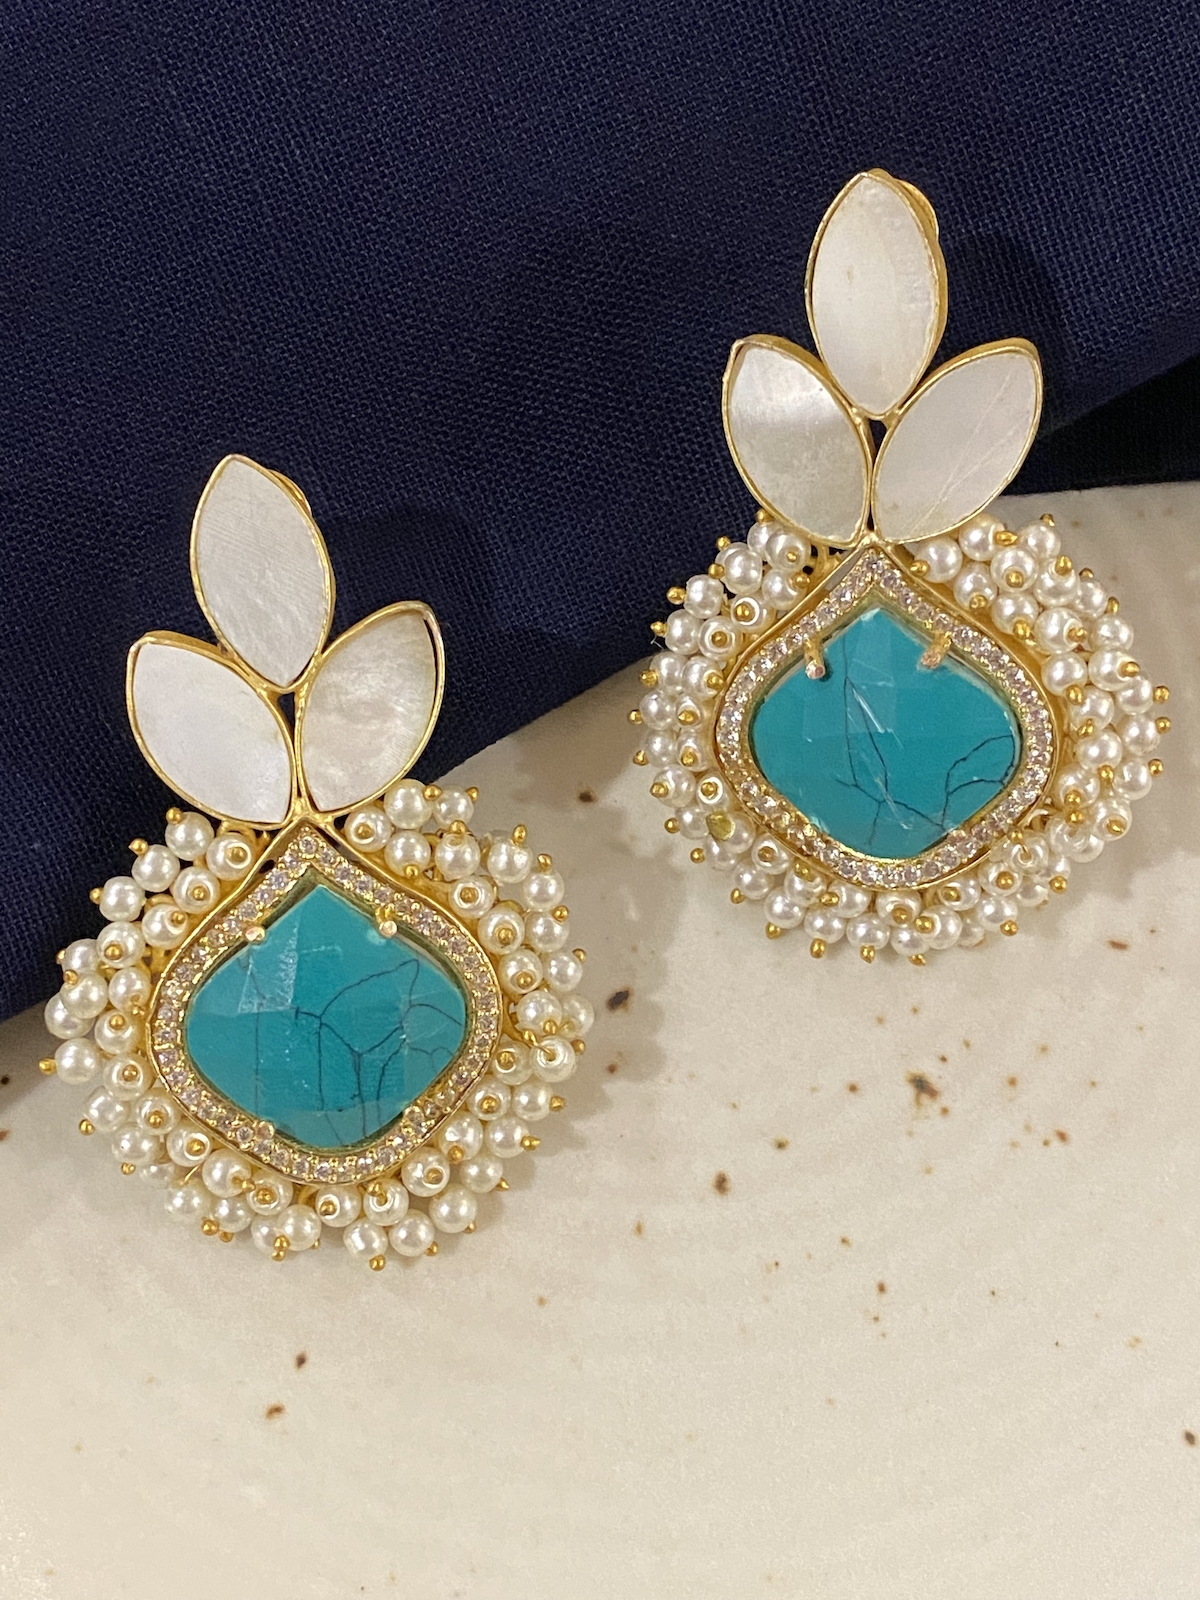 Swabhimann Jewellery | Swabhimann Anvi Druzy Earrings with Ferozi and White Stones